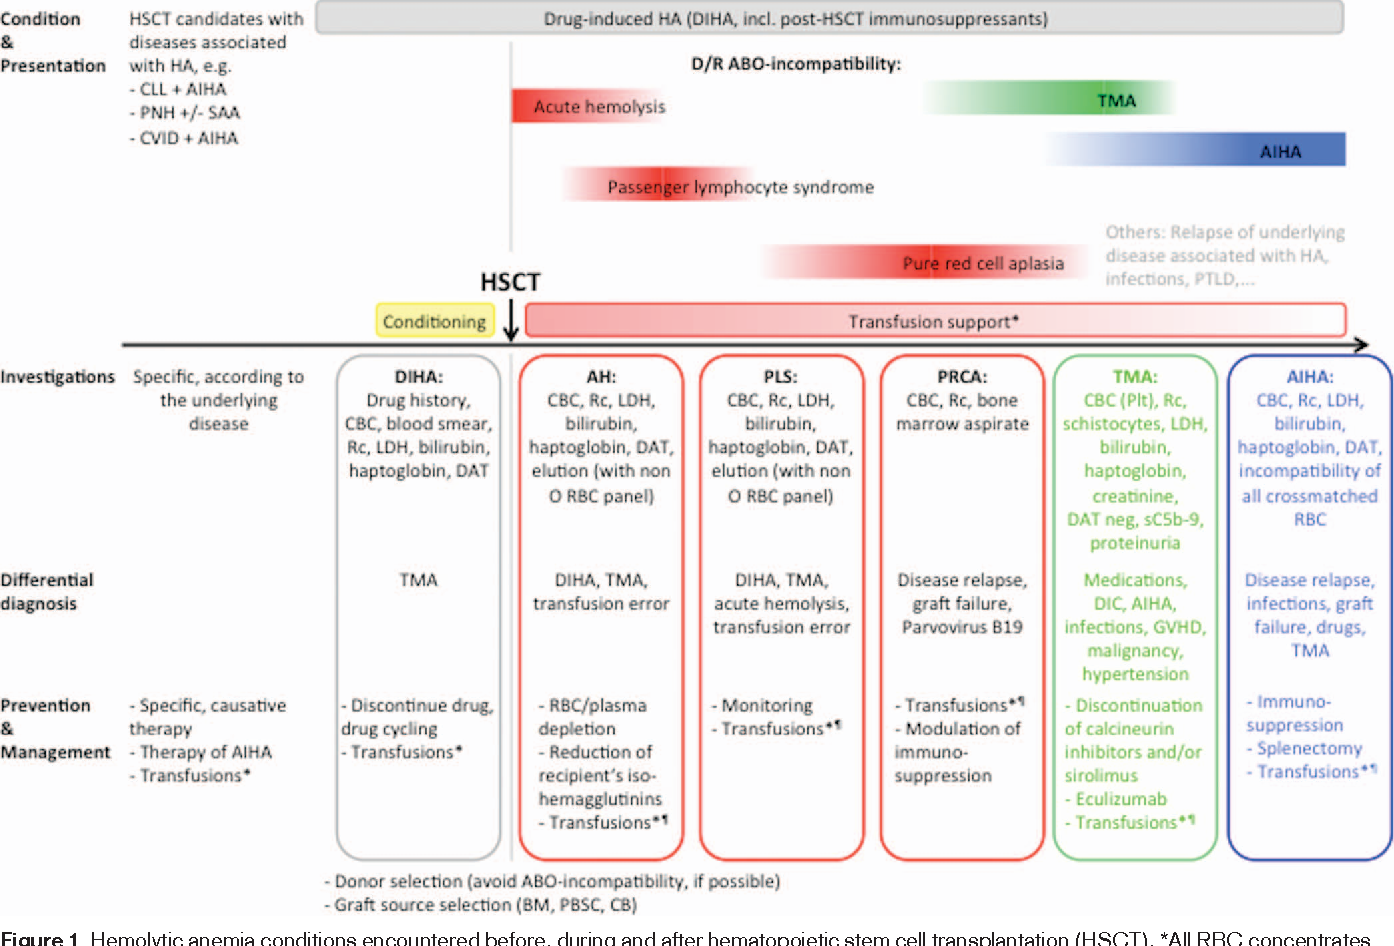 Pdf Management Of Hemolytic Anemia Following Allogeneic Stem Cell Transplantation Semantic Scholar